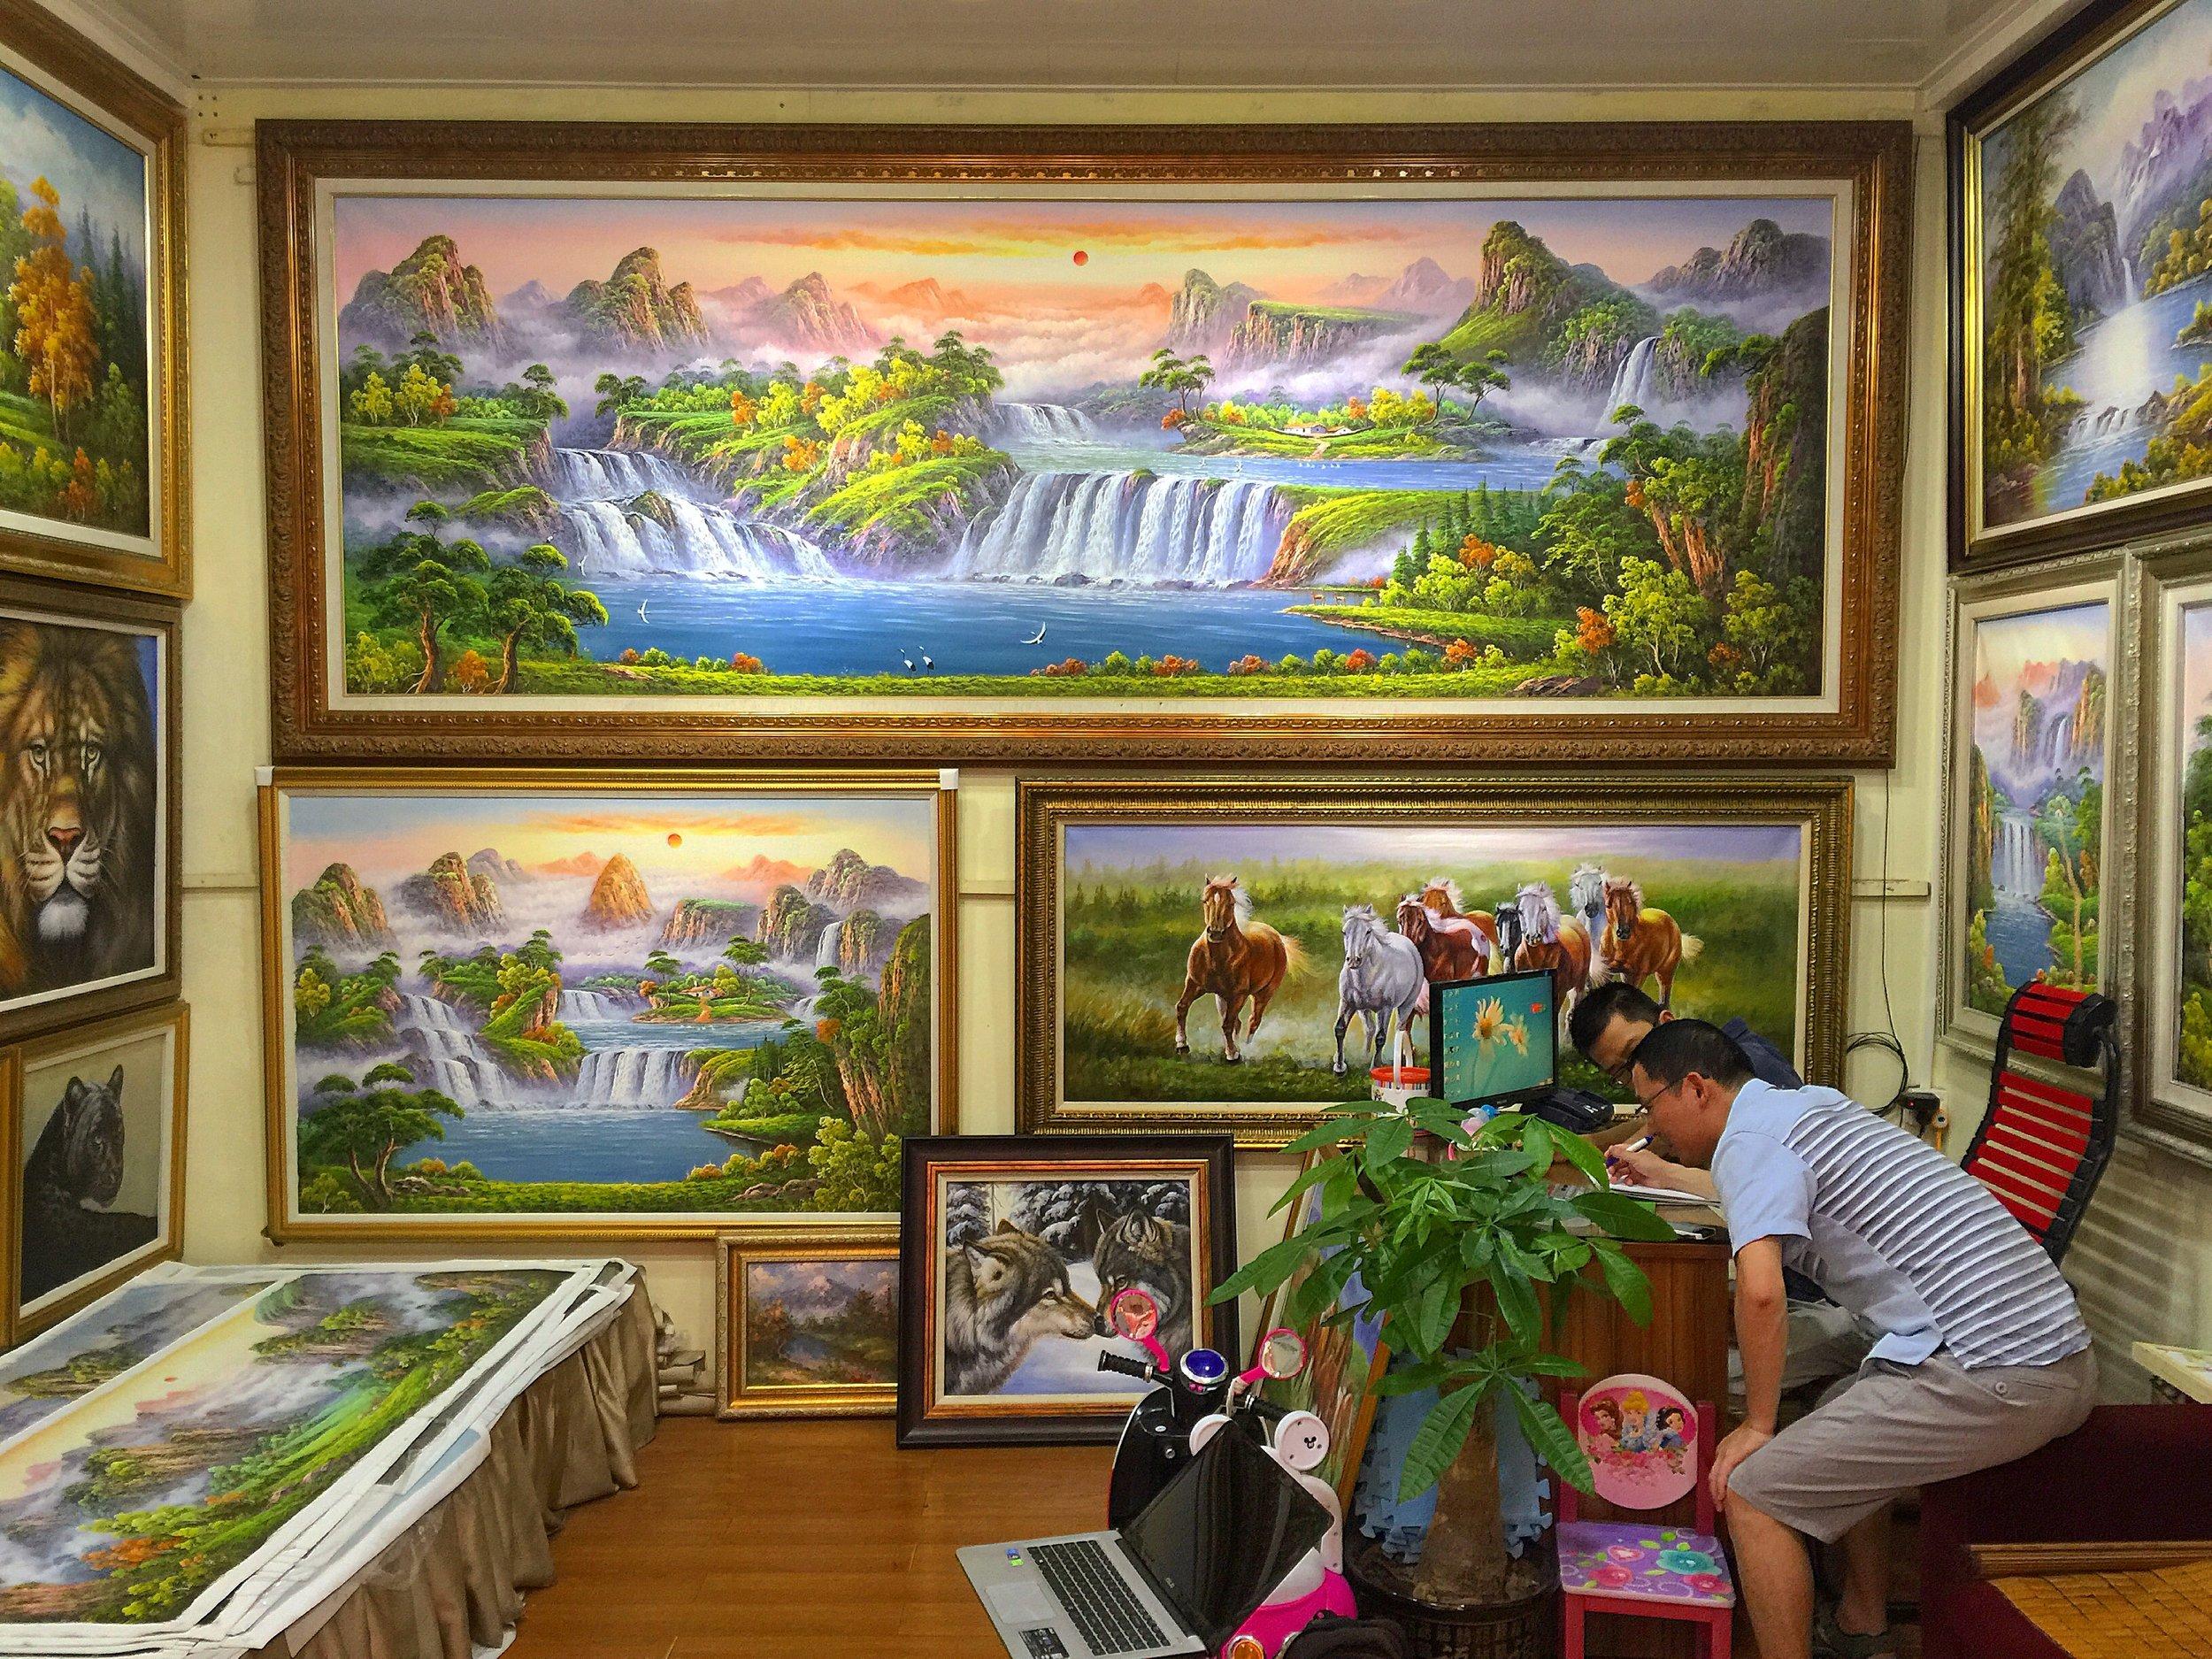 china_02_paintingPOS_alexandertarrant.JPG